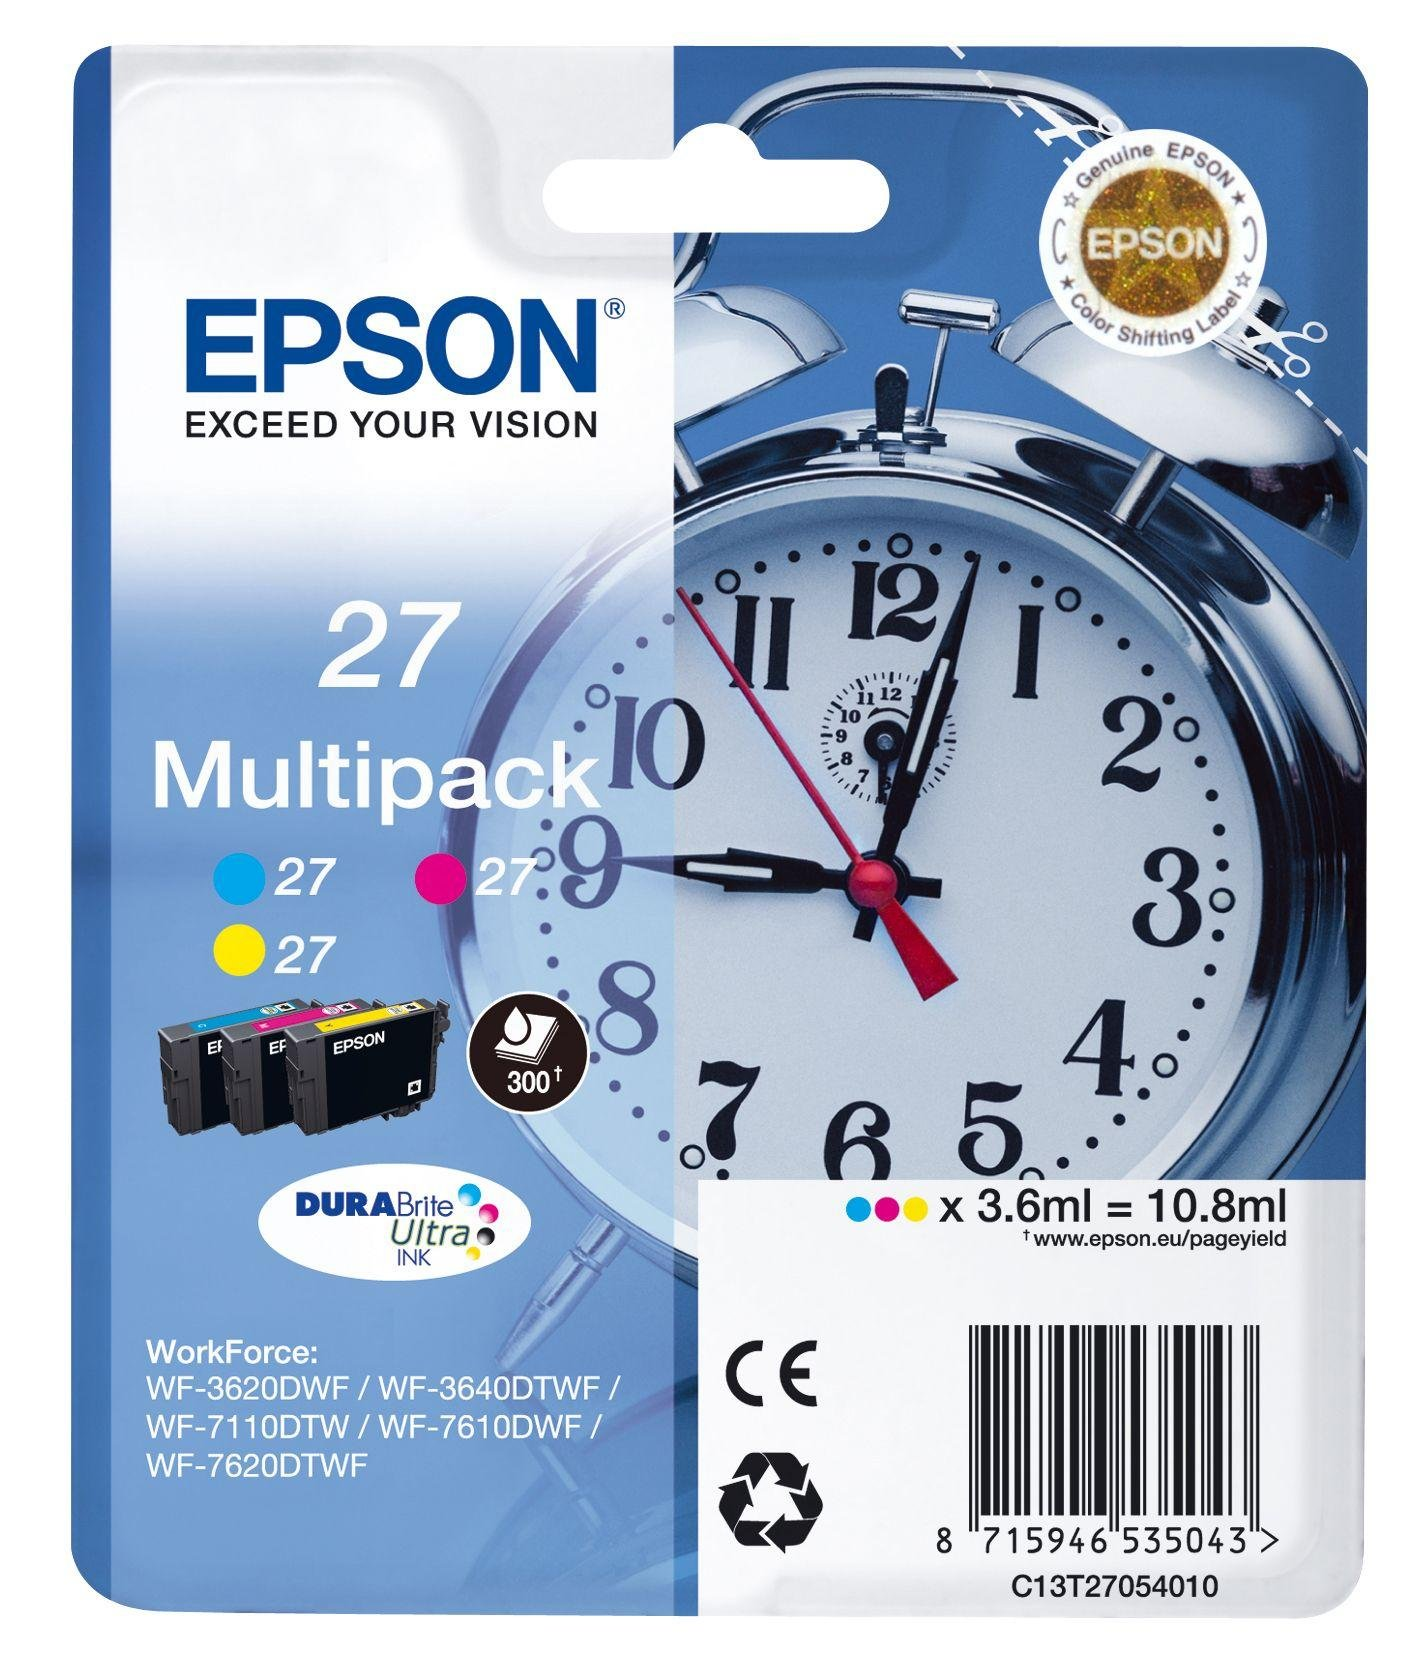 Epson Alarm Clock 27 Ink Cartridges Multipack review